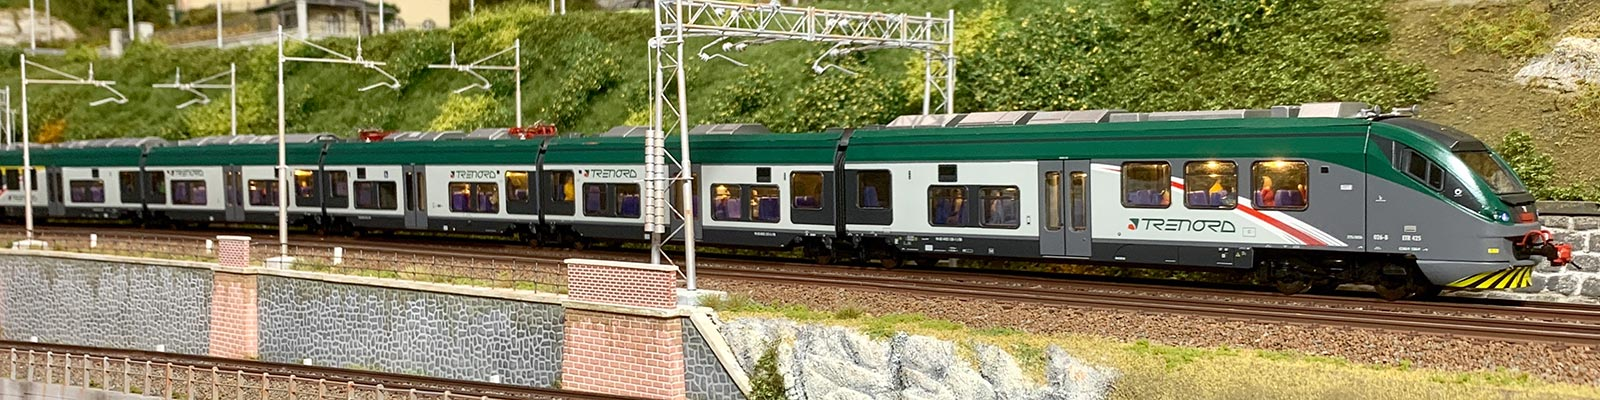 ETR425-Trenord Vitrains